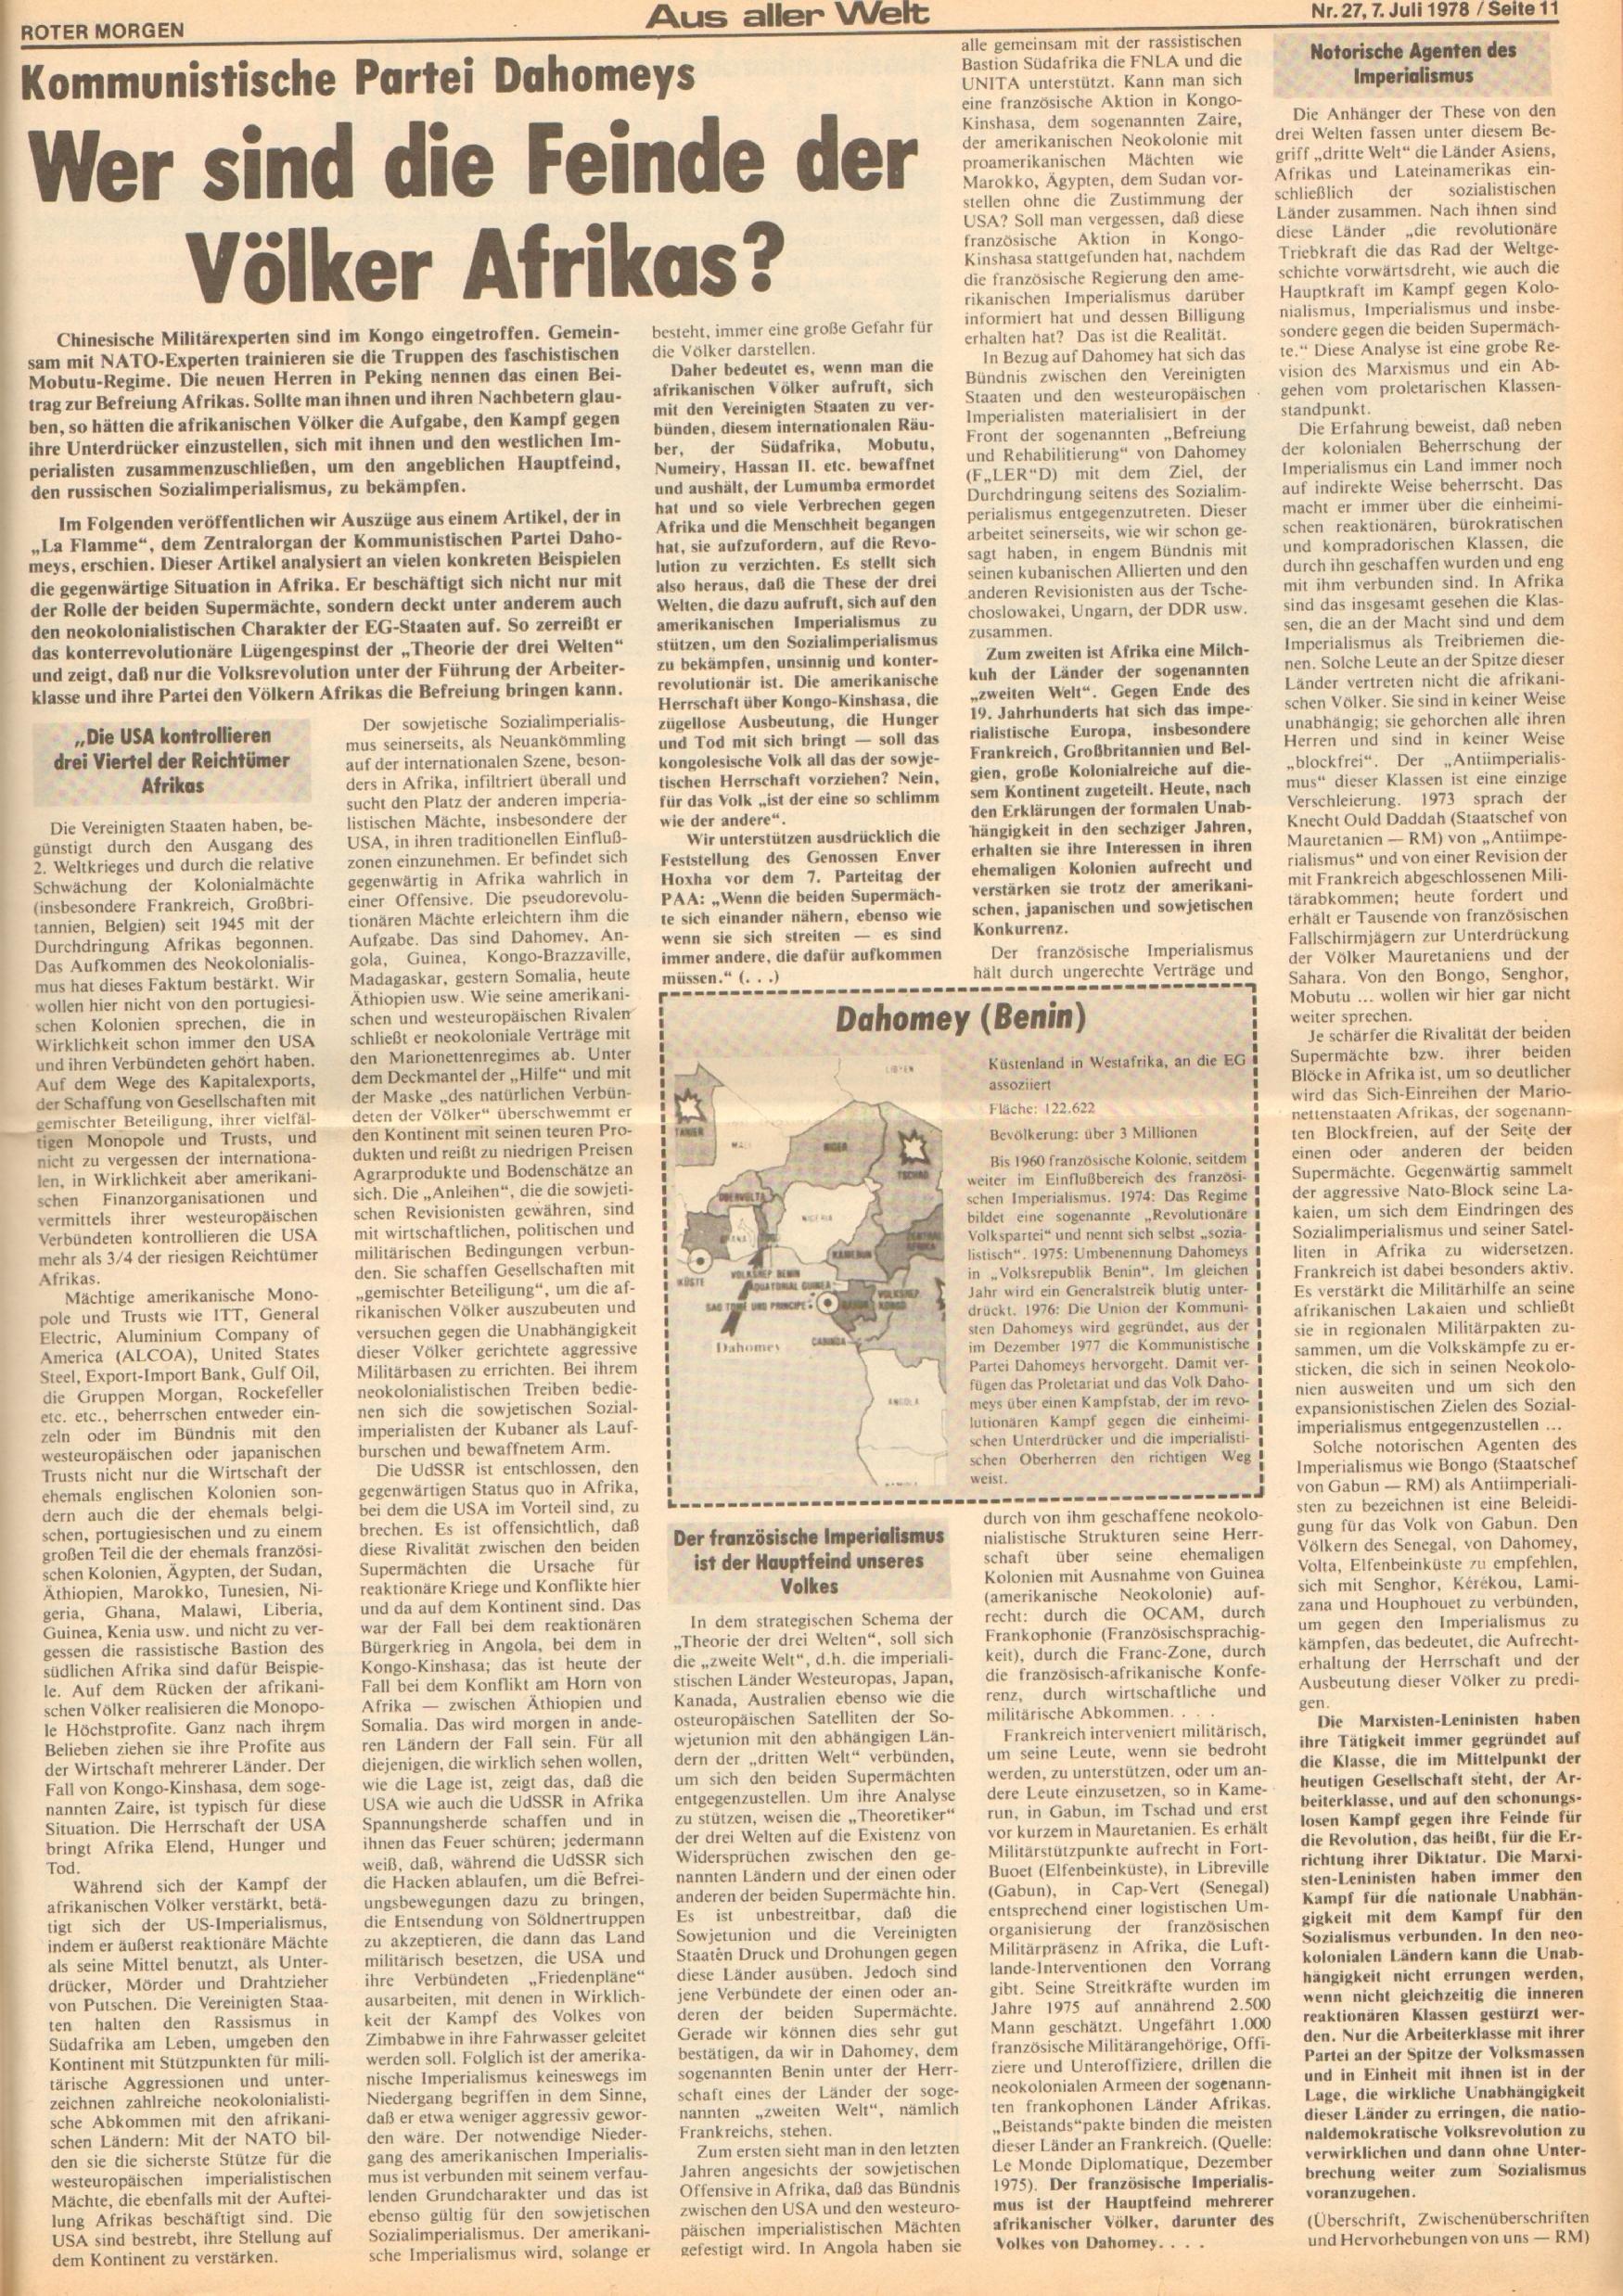 Roter Morgen, 12. Jg., 7. Juli 1978, Nr. 27, Seite 11